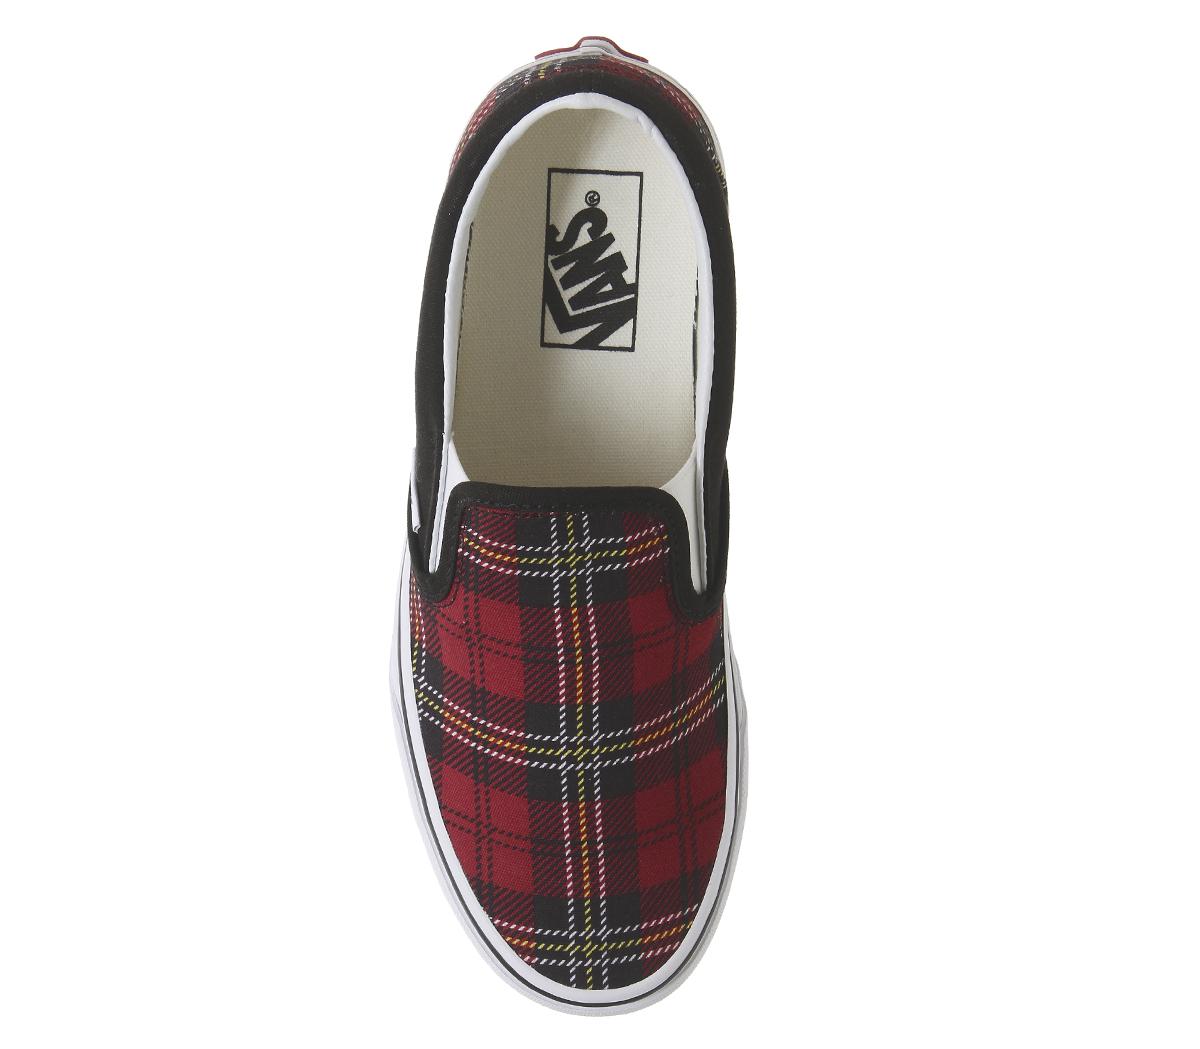 23a1a701556 Womens Vans Vans Classic Slip On Trainers Chili Pepper True White ...